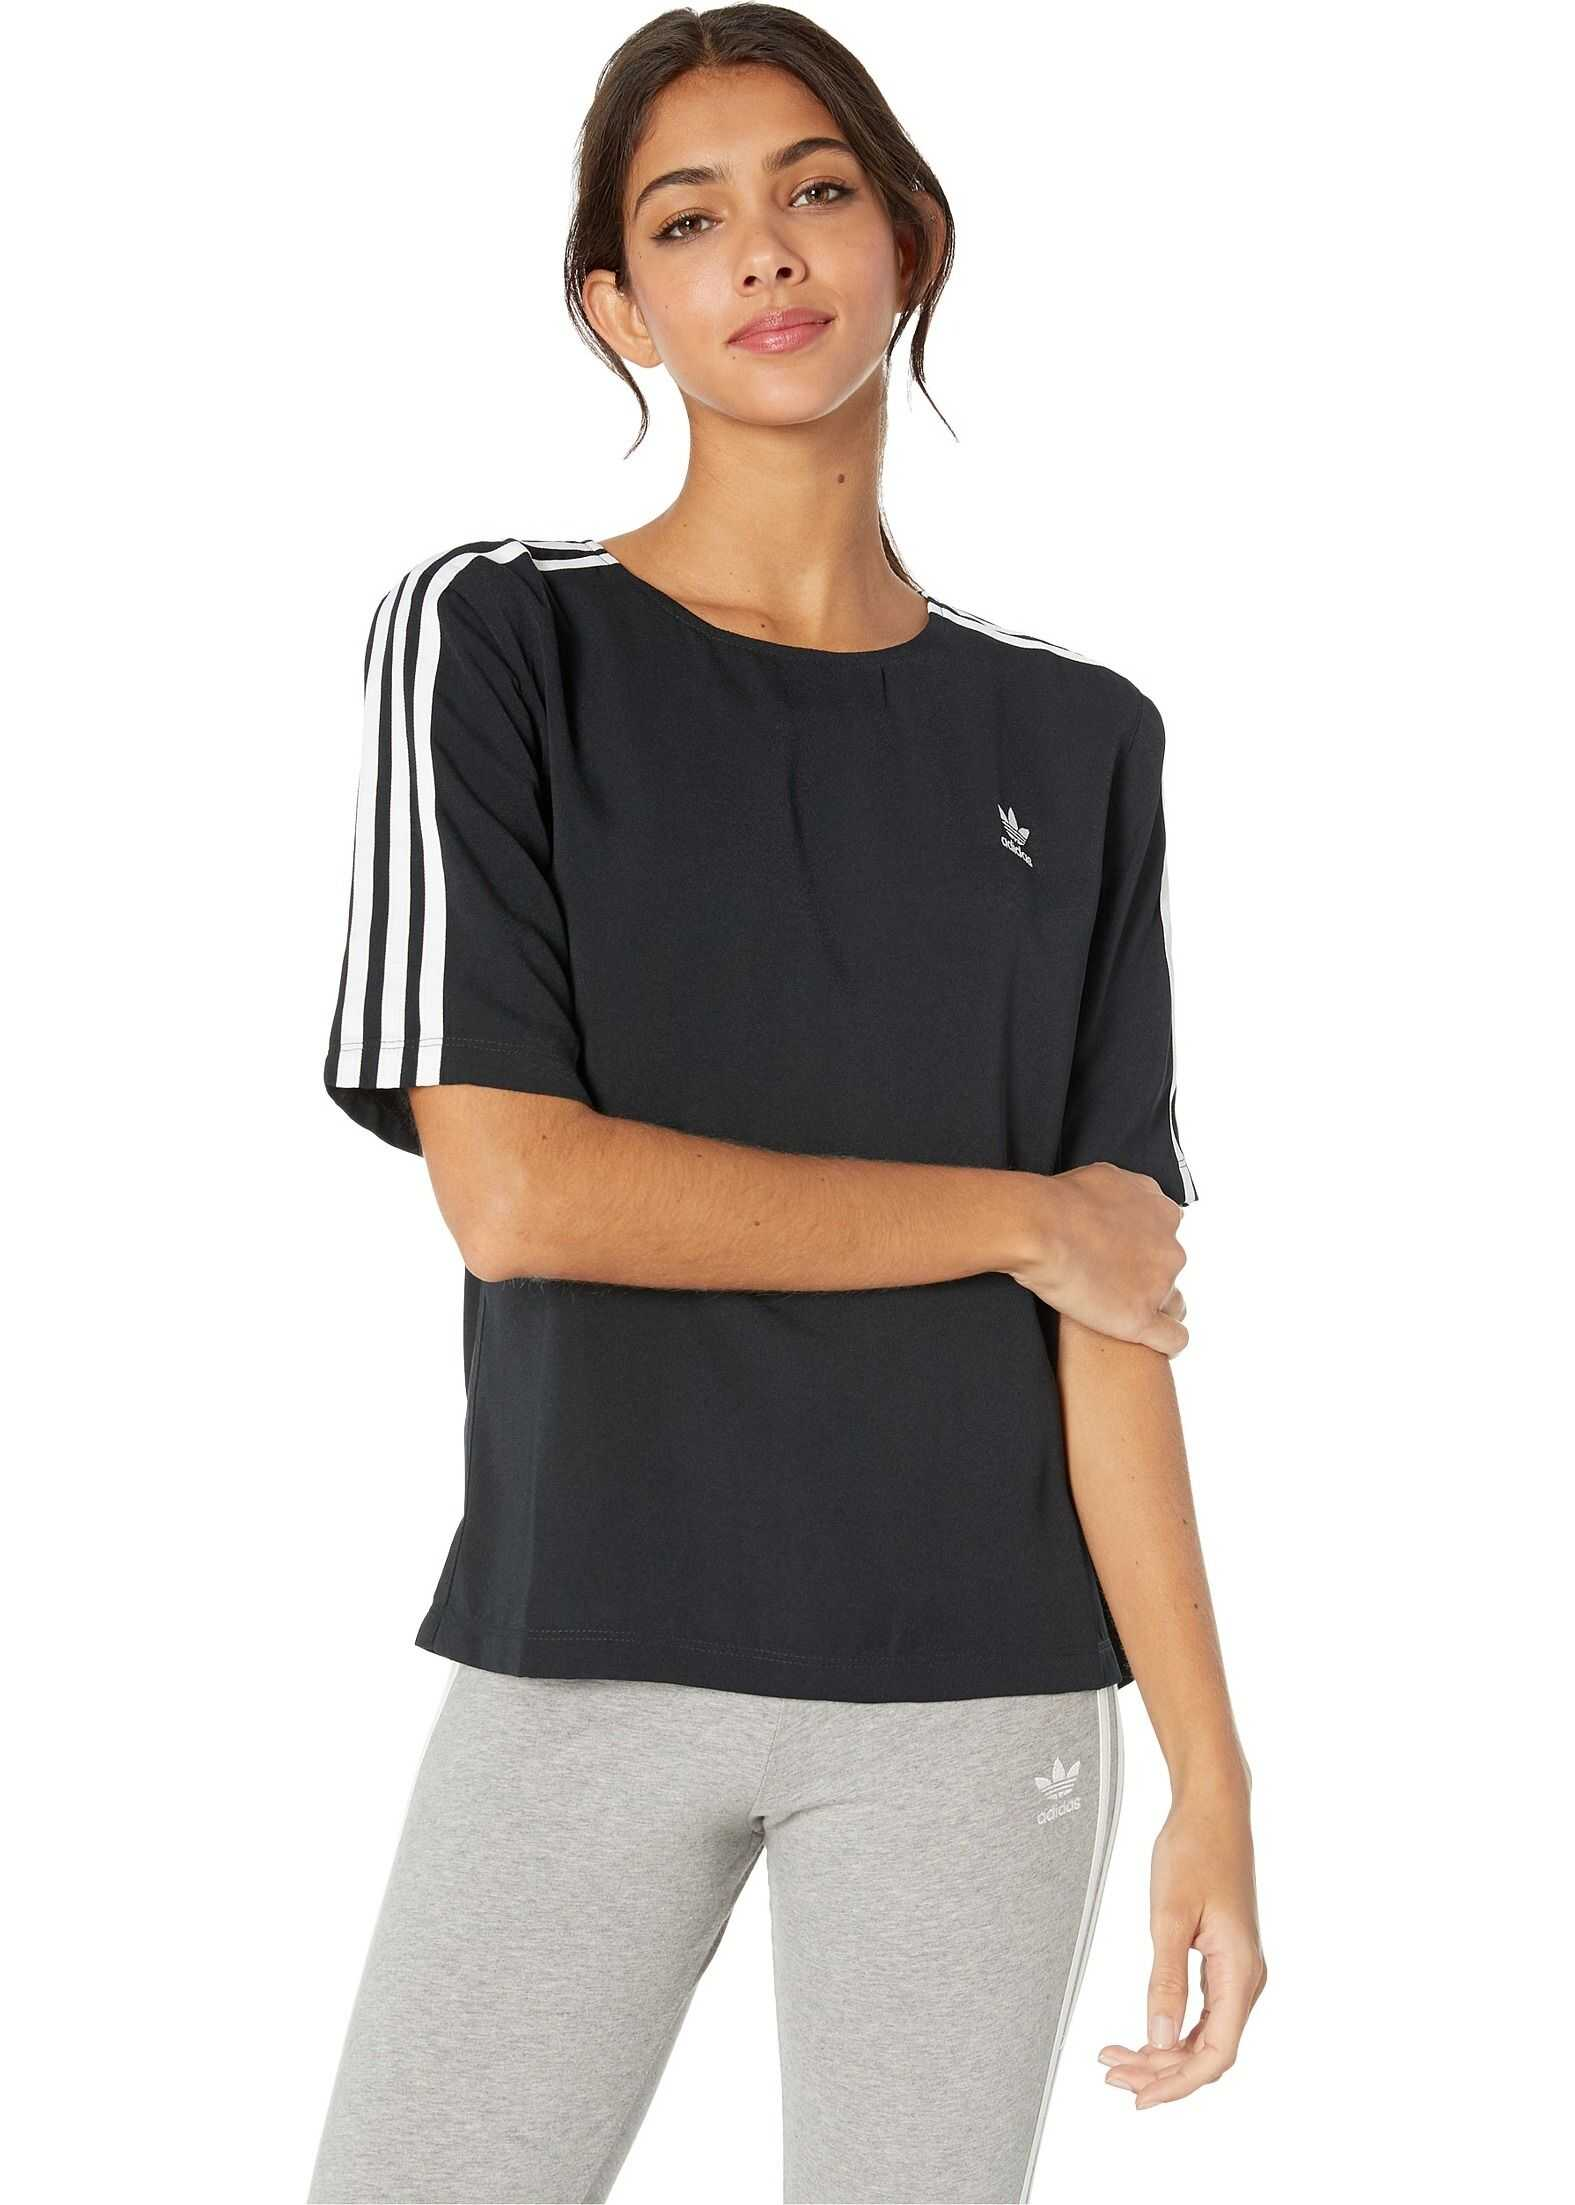 adidas Originals 3-Stripes Tee Black 1